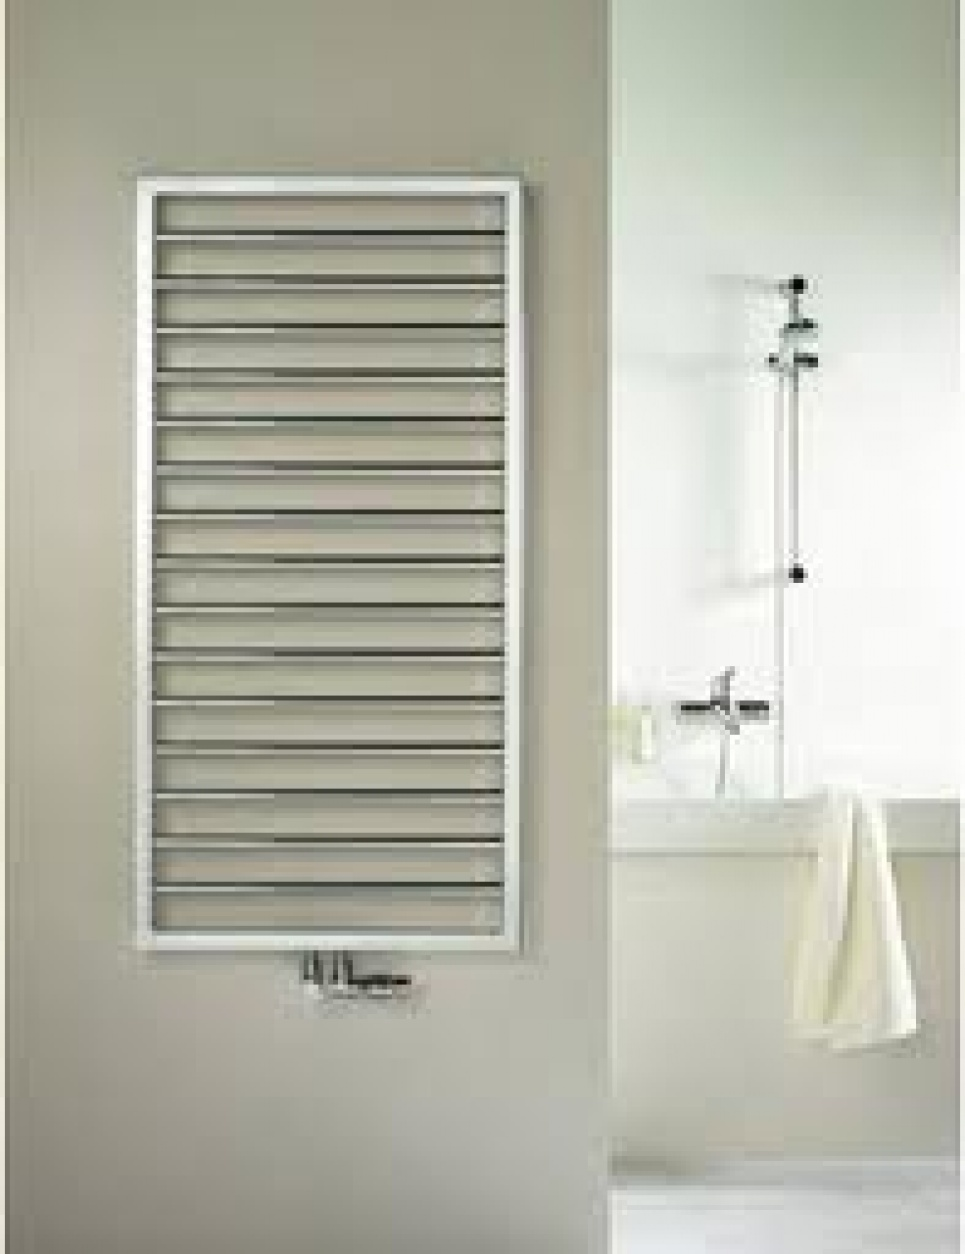 Badkamer Geiser Kopen ~ Badkamerverwarming  Design radiatoren  Vloerverwarming  Elektrische